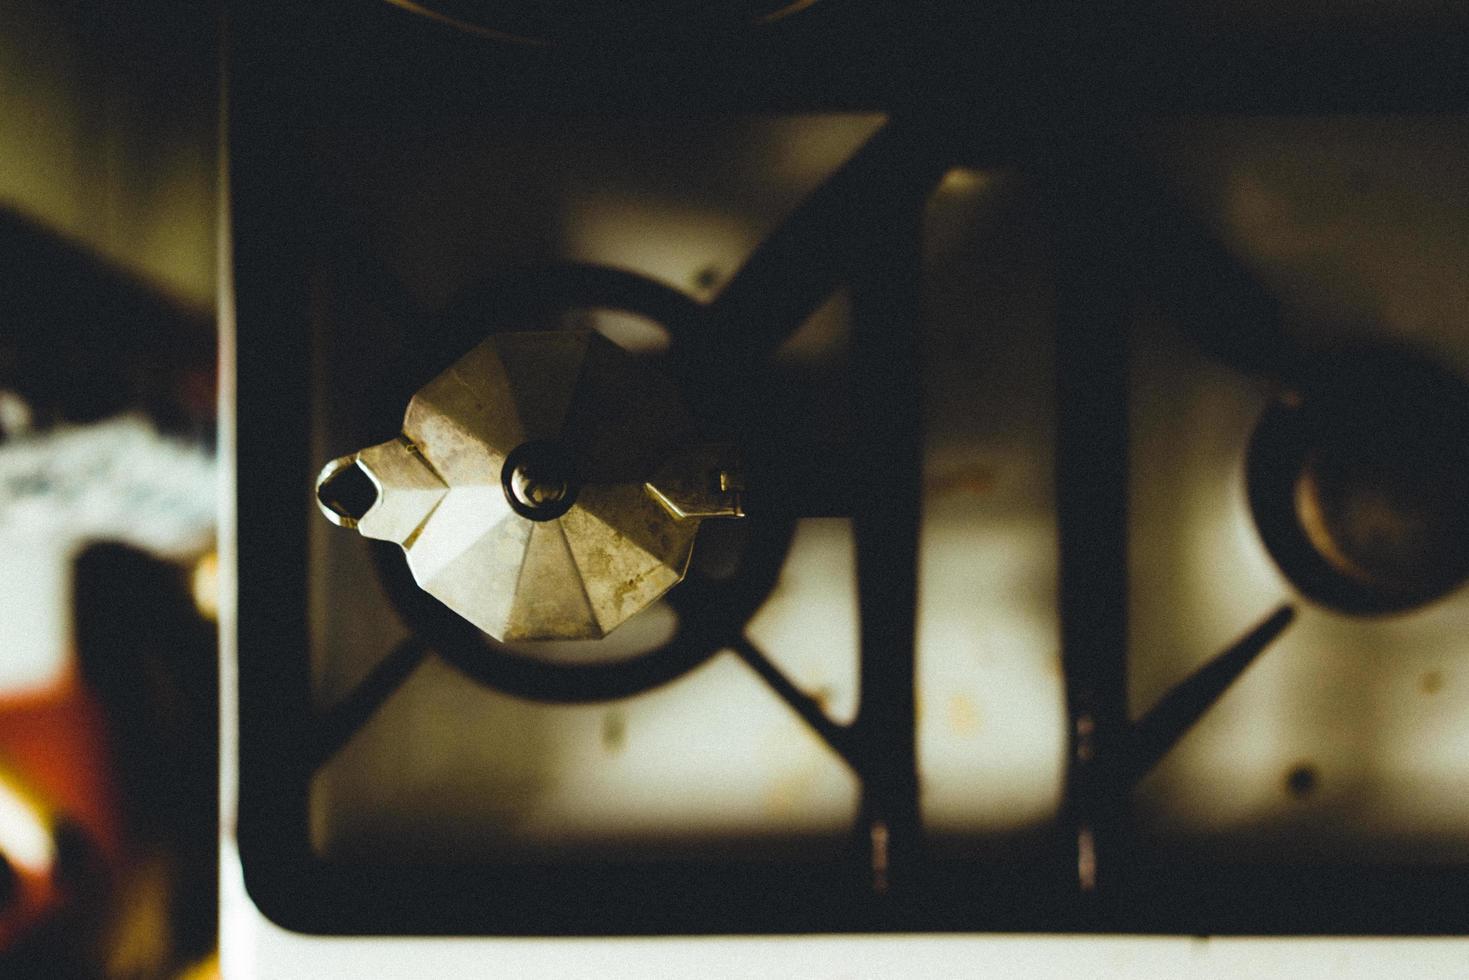 2-brännare gasspis foto